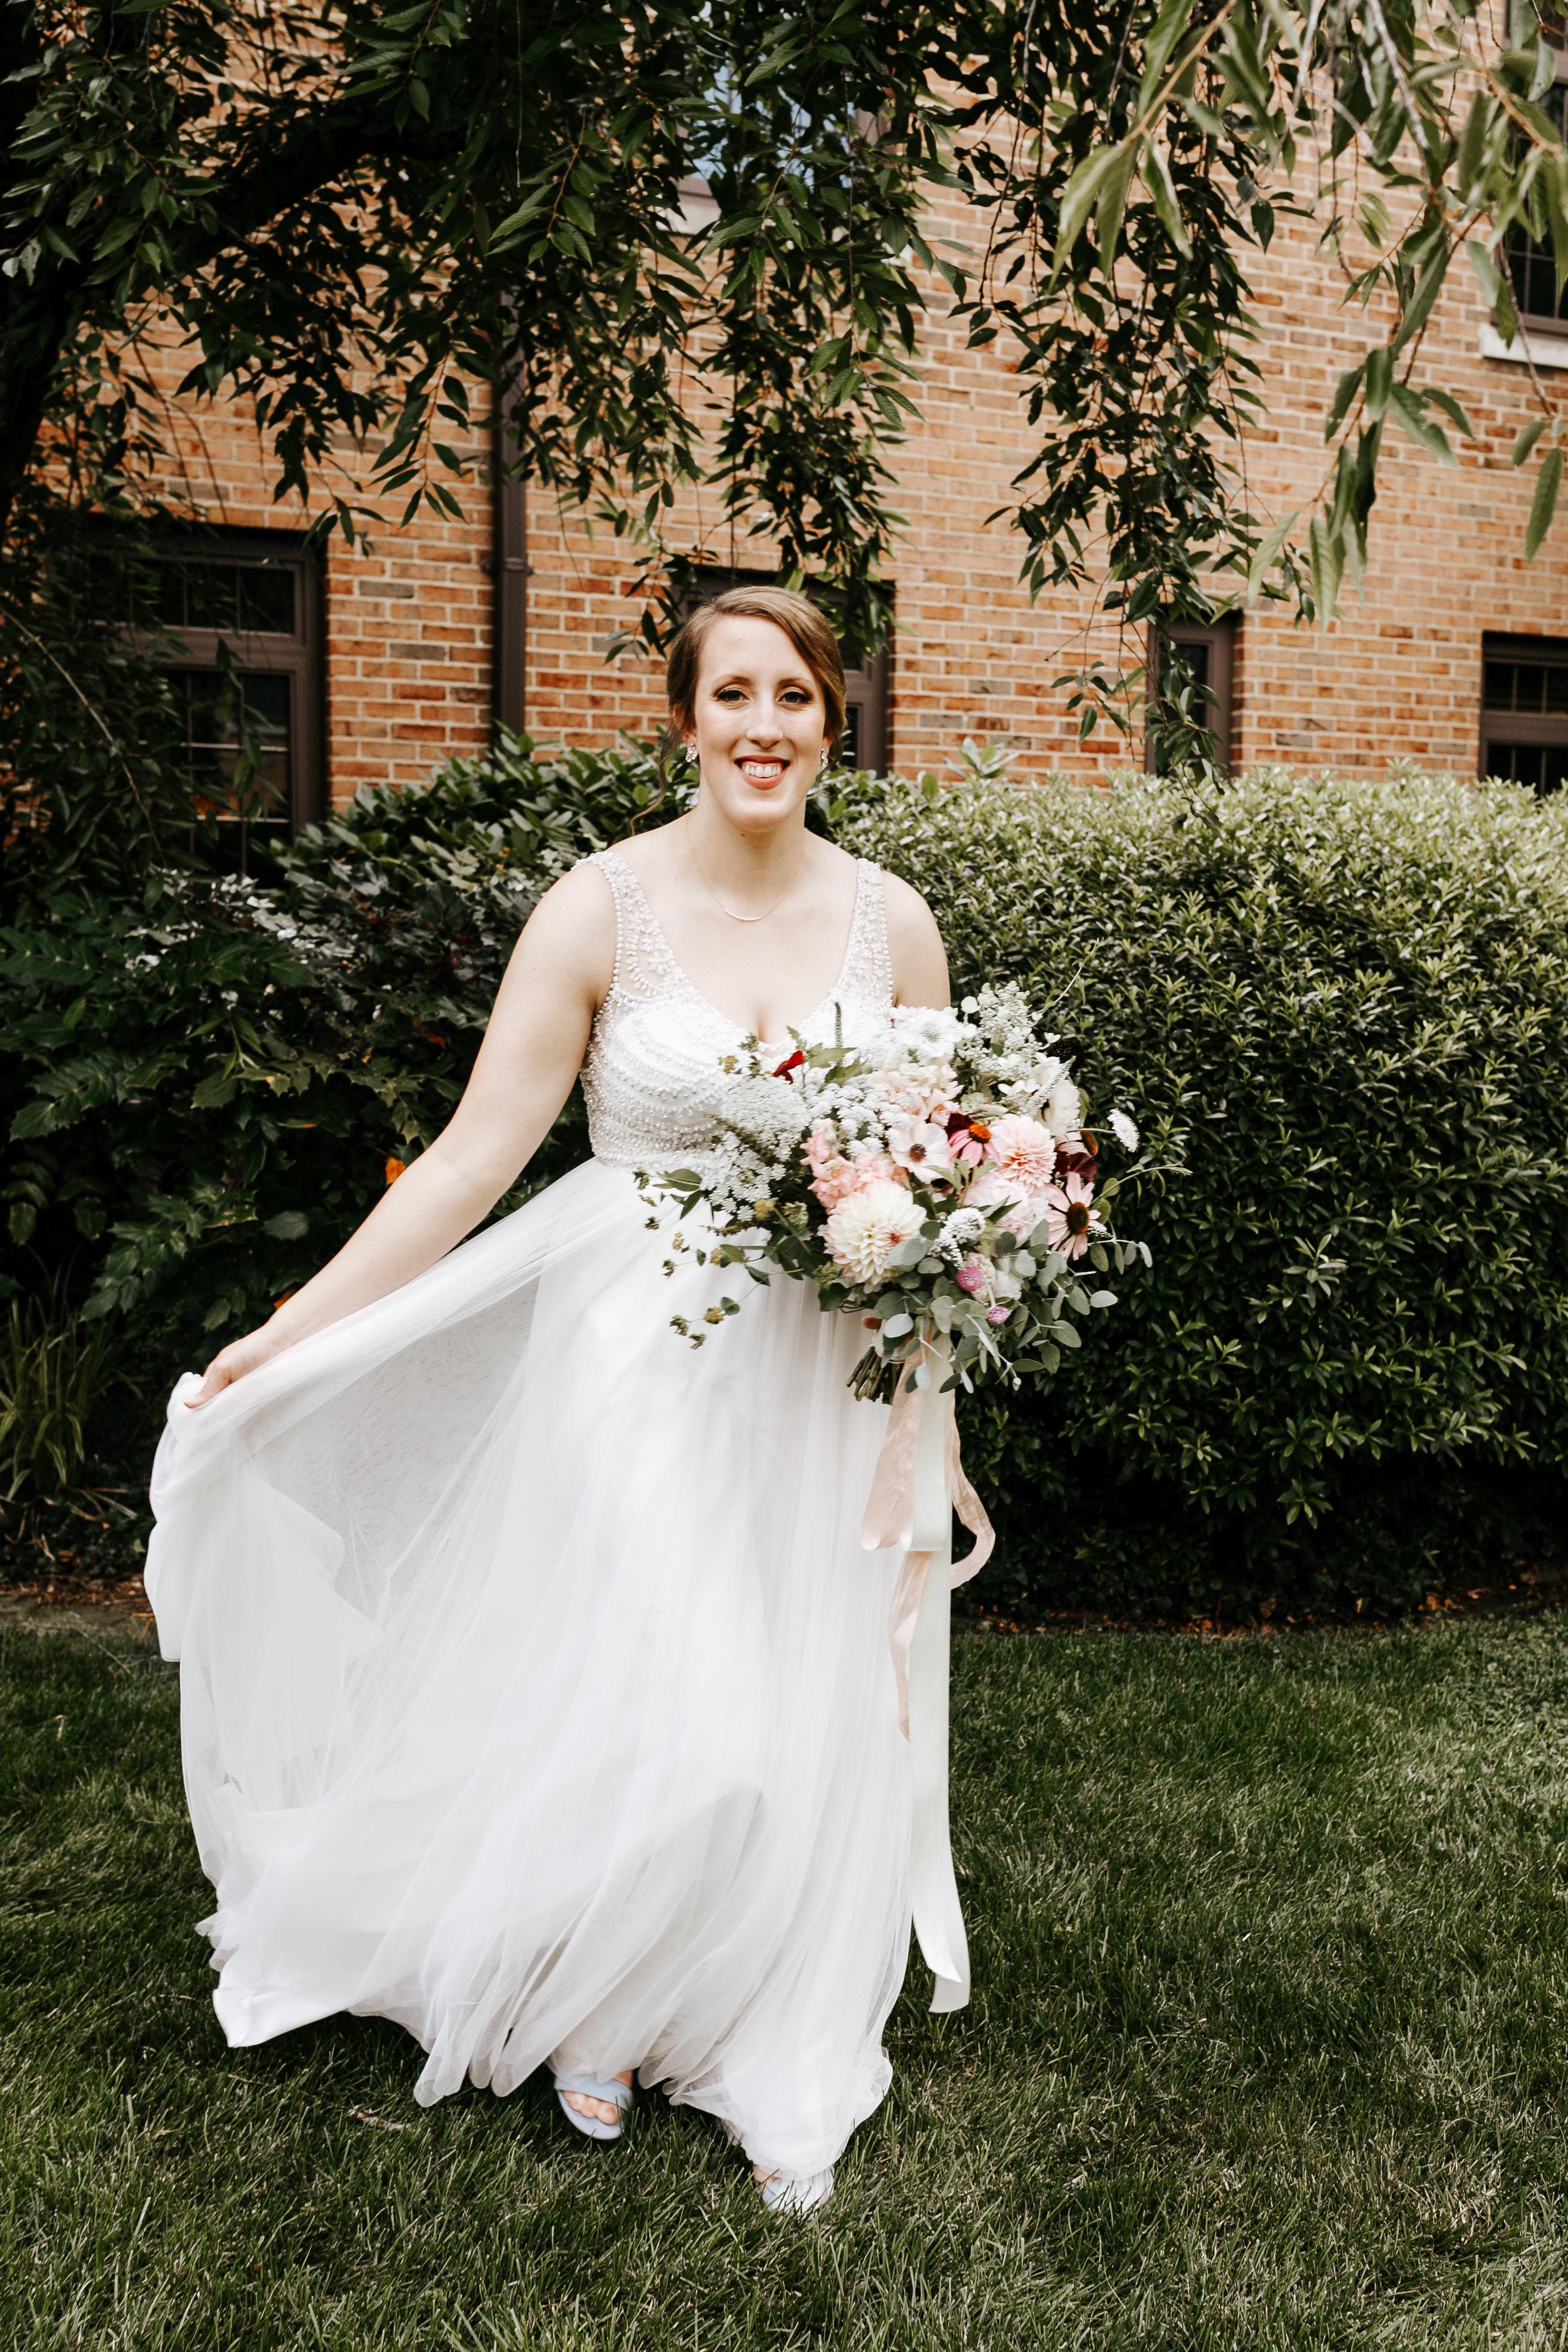 bohemian-photographer-wedding-tennessee-18.jpg